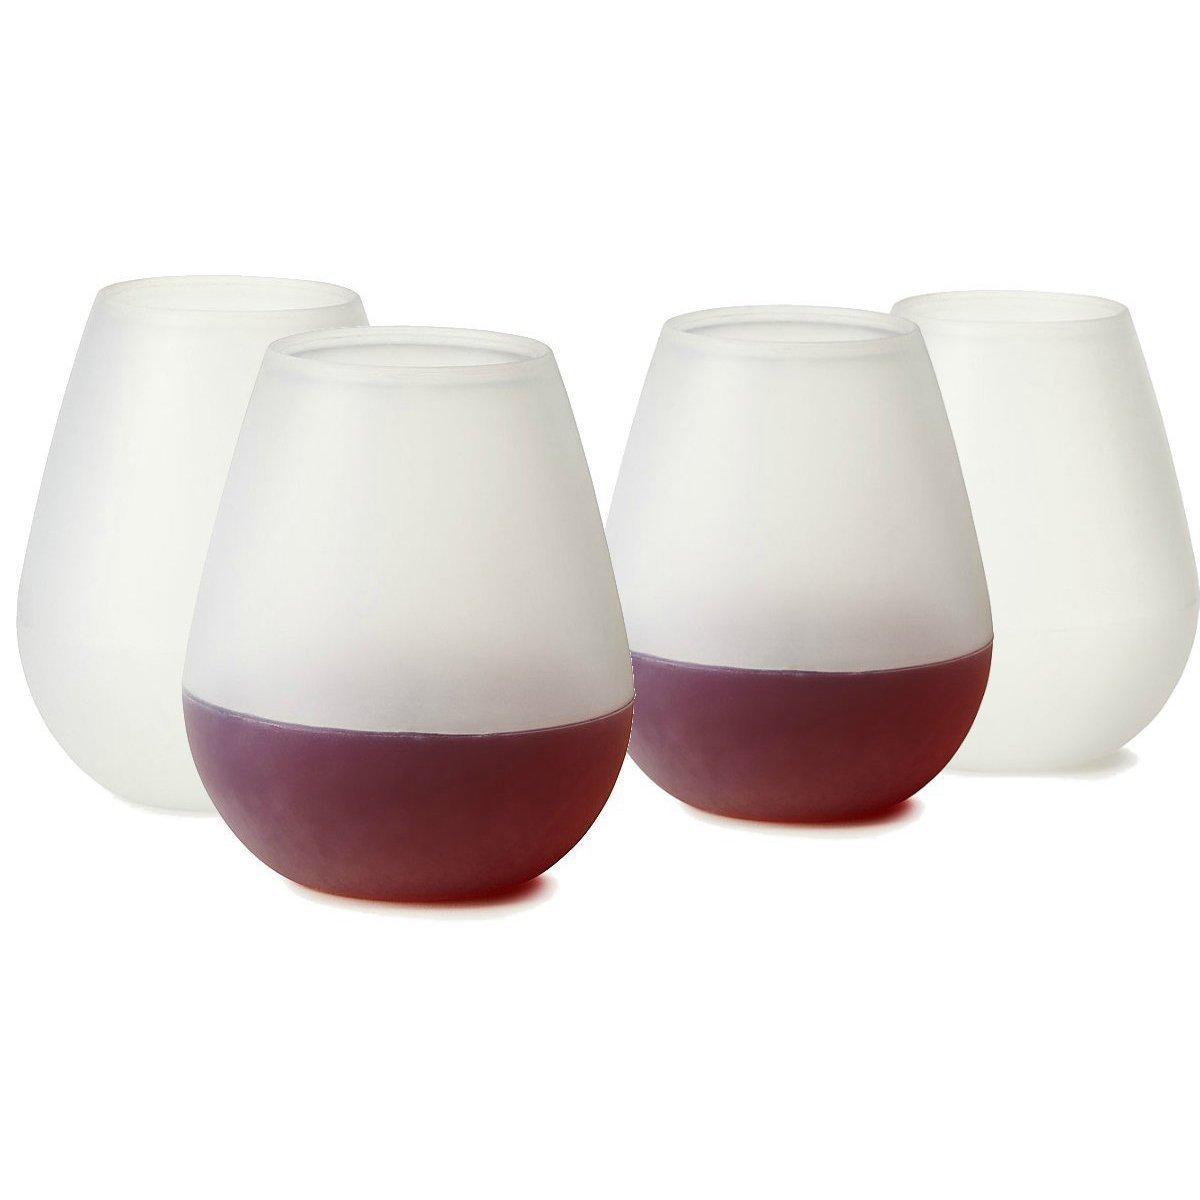 Hairy Or Bbq Shatterproof Reusable Makes A Wine Gift Bulk Set 4 Freshlove Silicone Wine Glasses 12oz Unbreakable Wine Walker Flexible Plastic Stemless Cups inspiration Bulk Wine Glasses